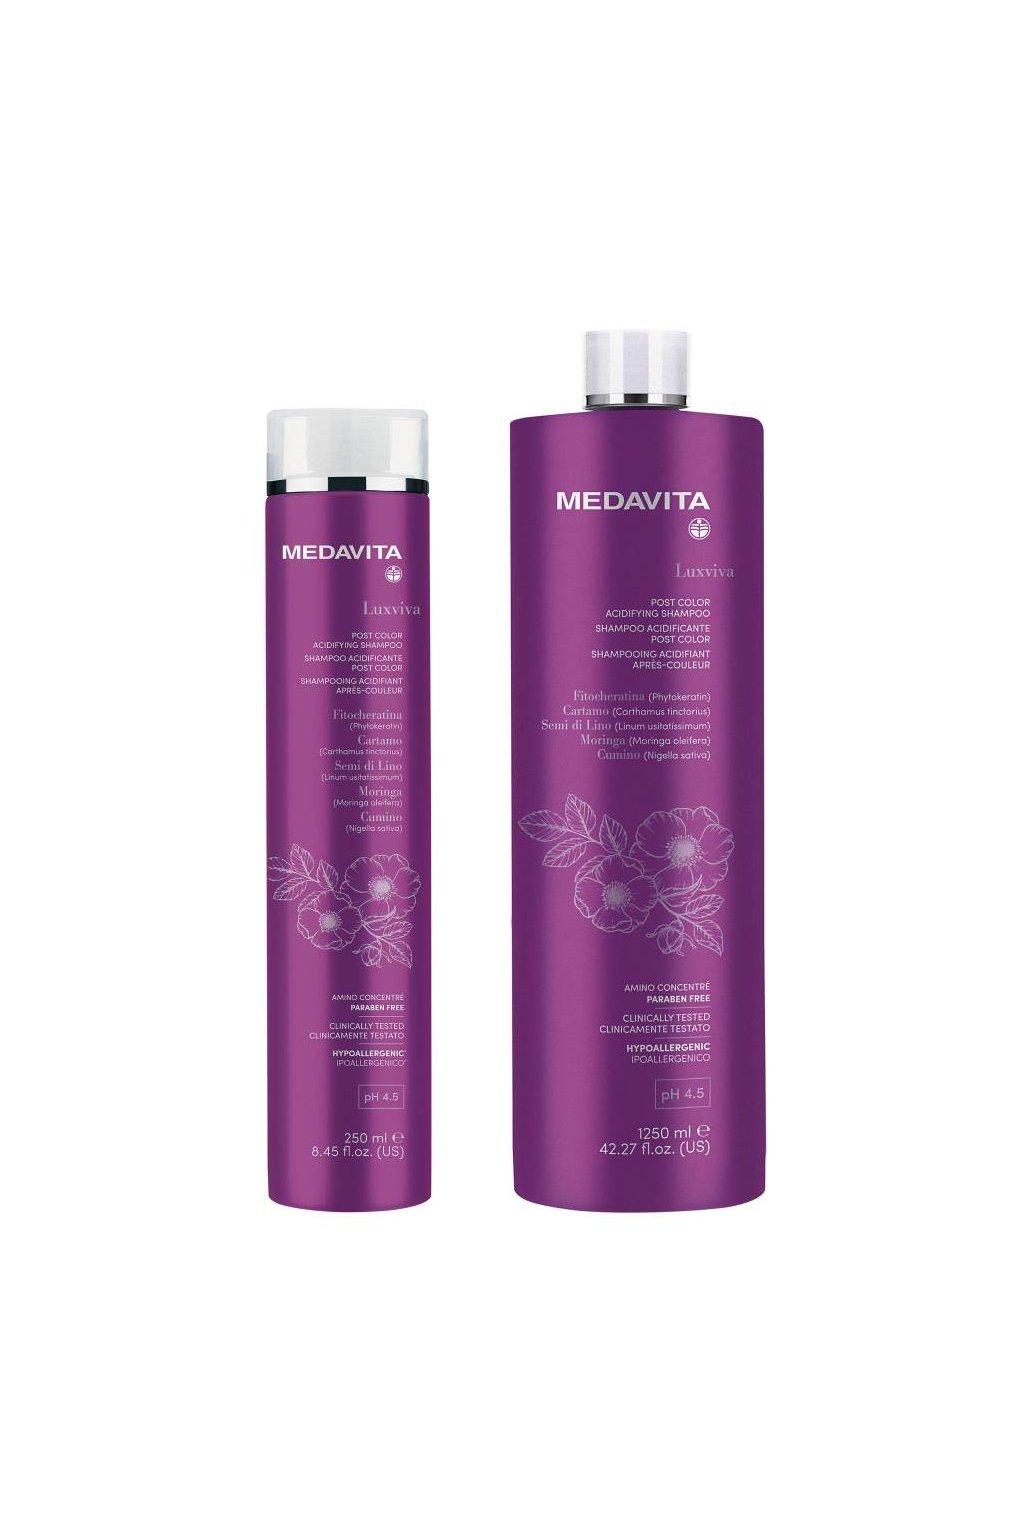 Medavita LUXVIVA Šampon Acid pro barvené vlasy s filtry UVA/UVB (Obsah 250 ml)